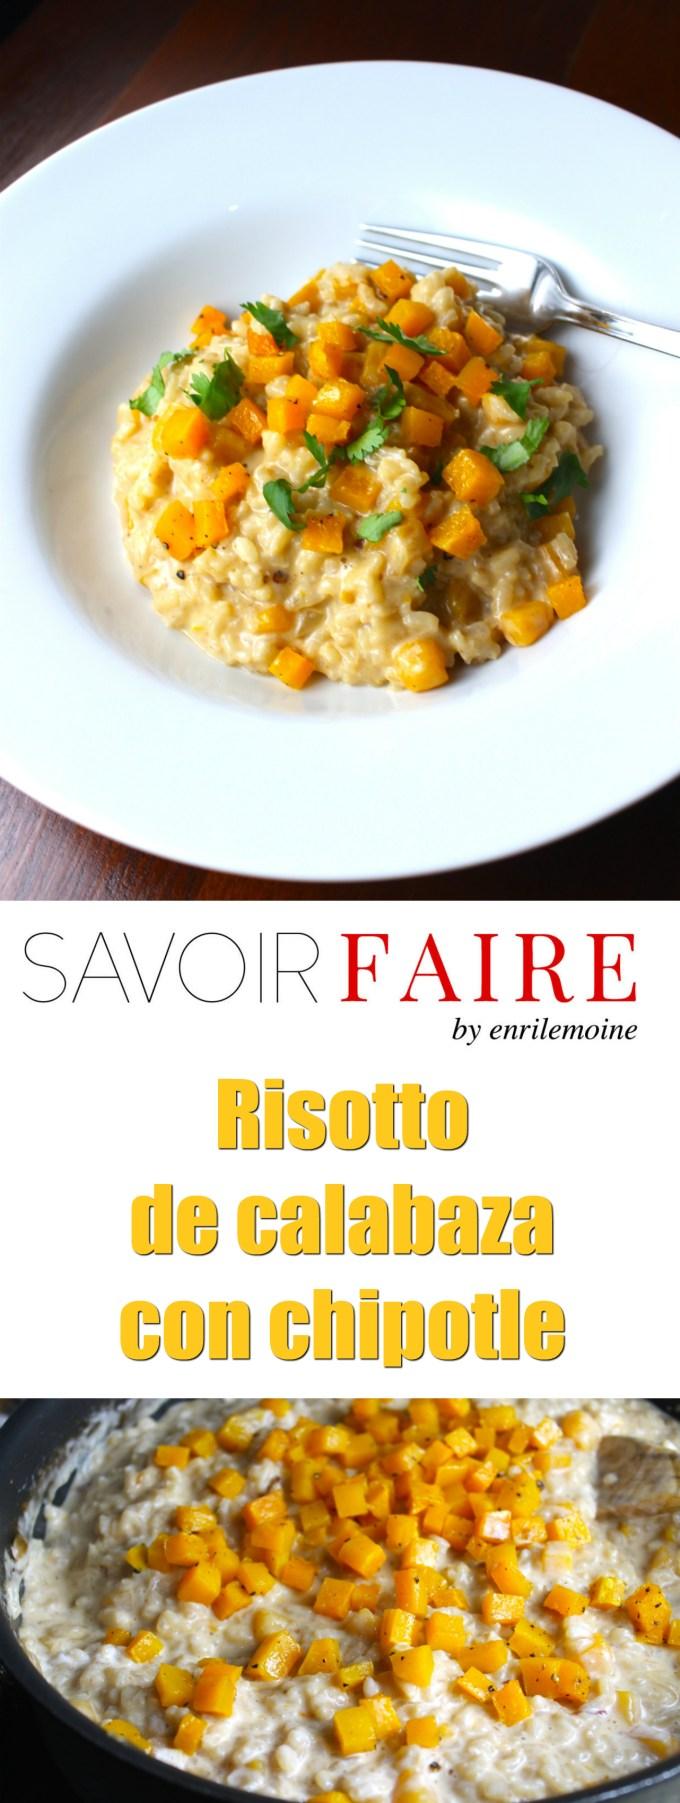 Risotto de calabaza y chipotle - SAVOIR FAIRE by enrilemoine